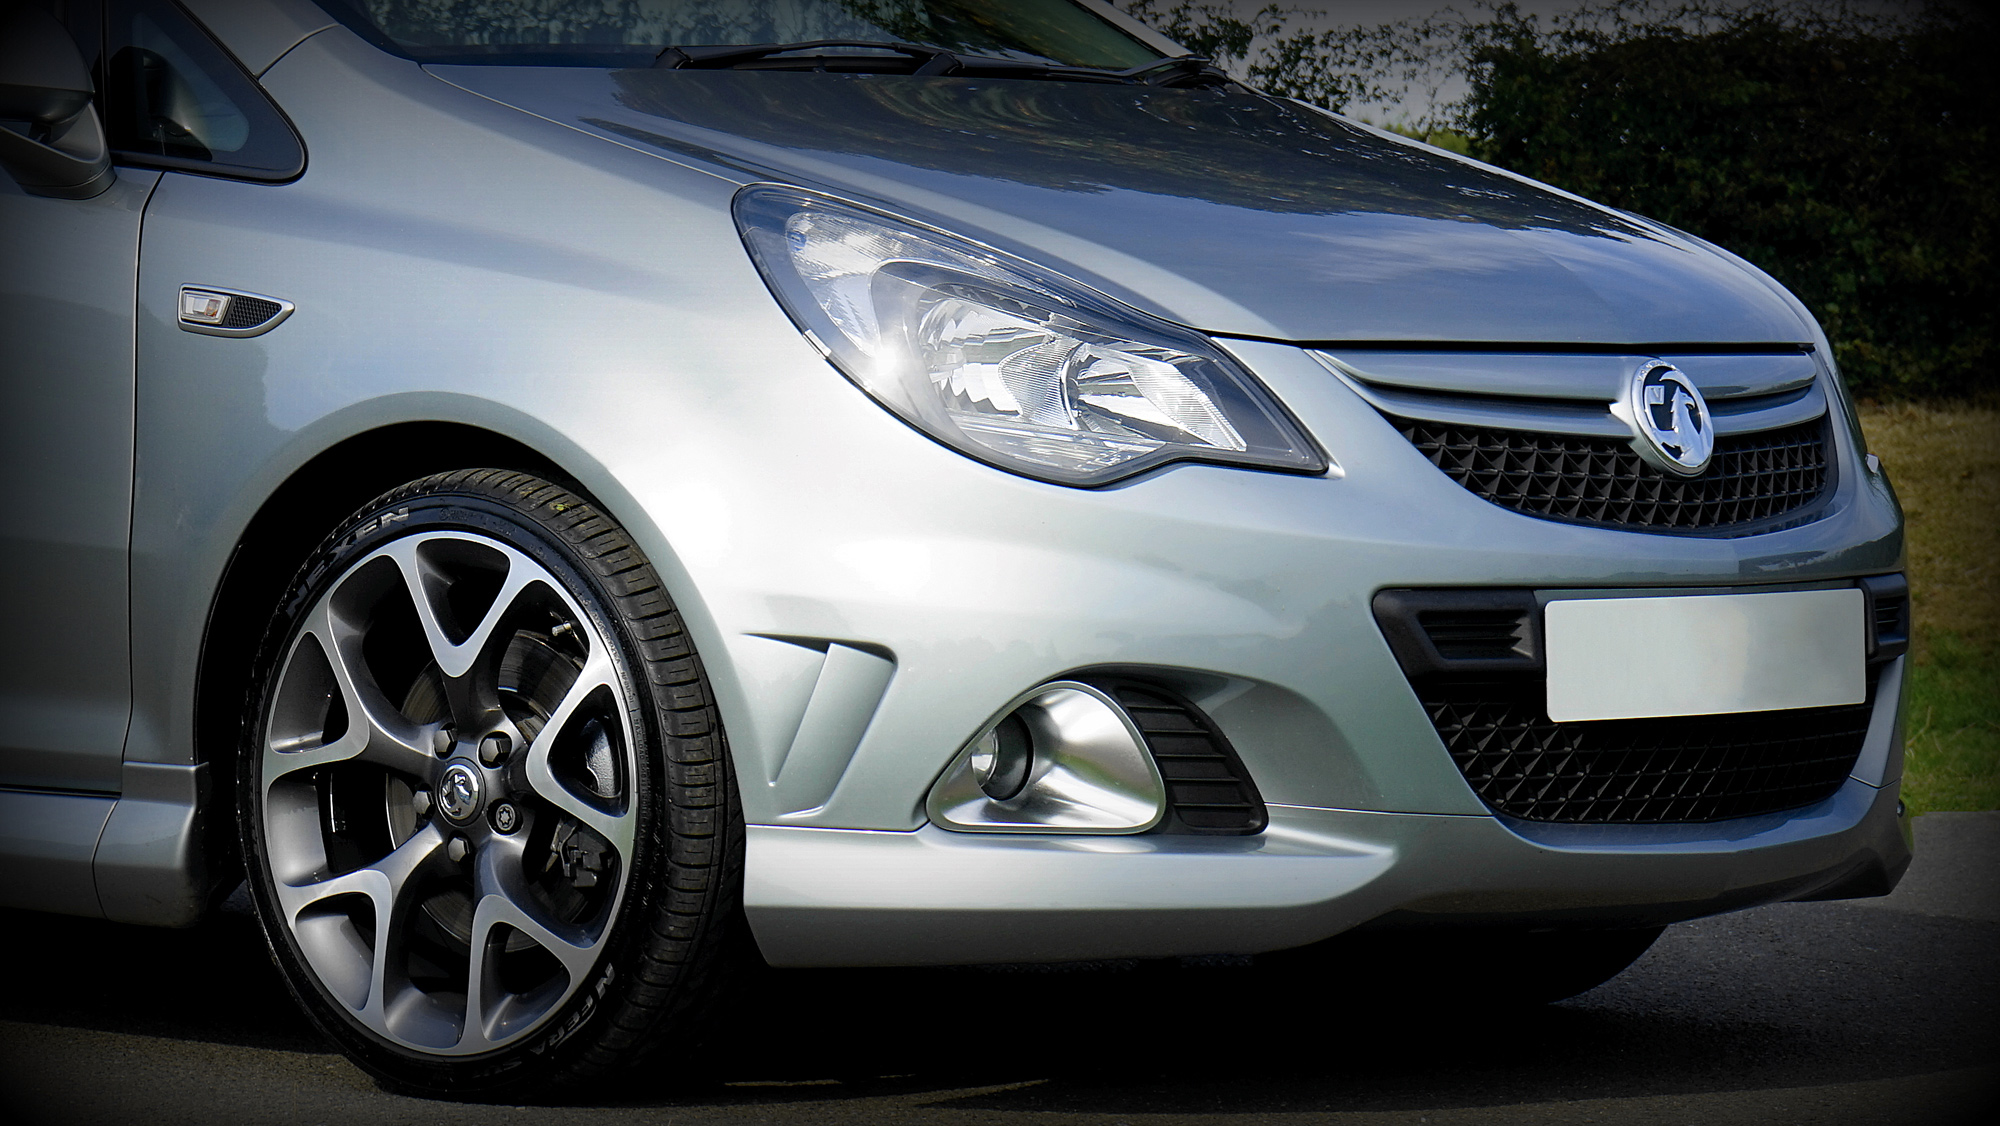 2015-Opel-Corsa-OPC